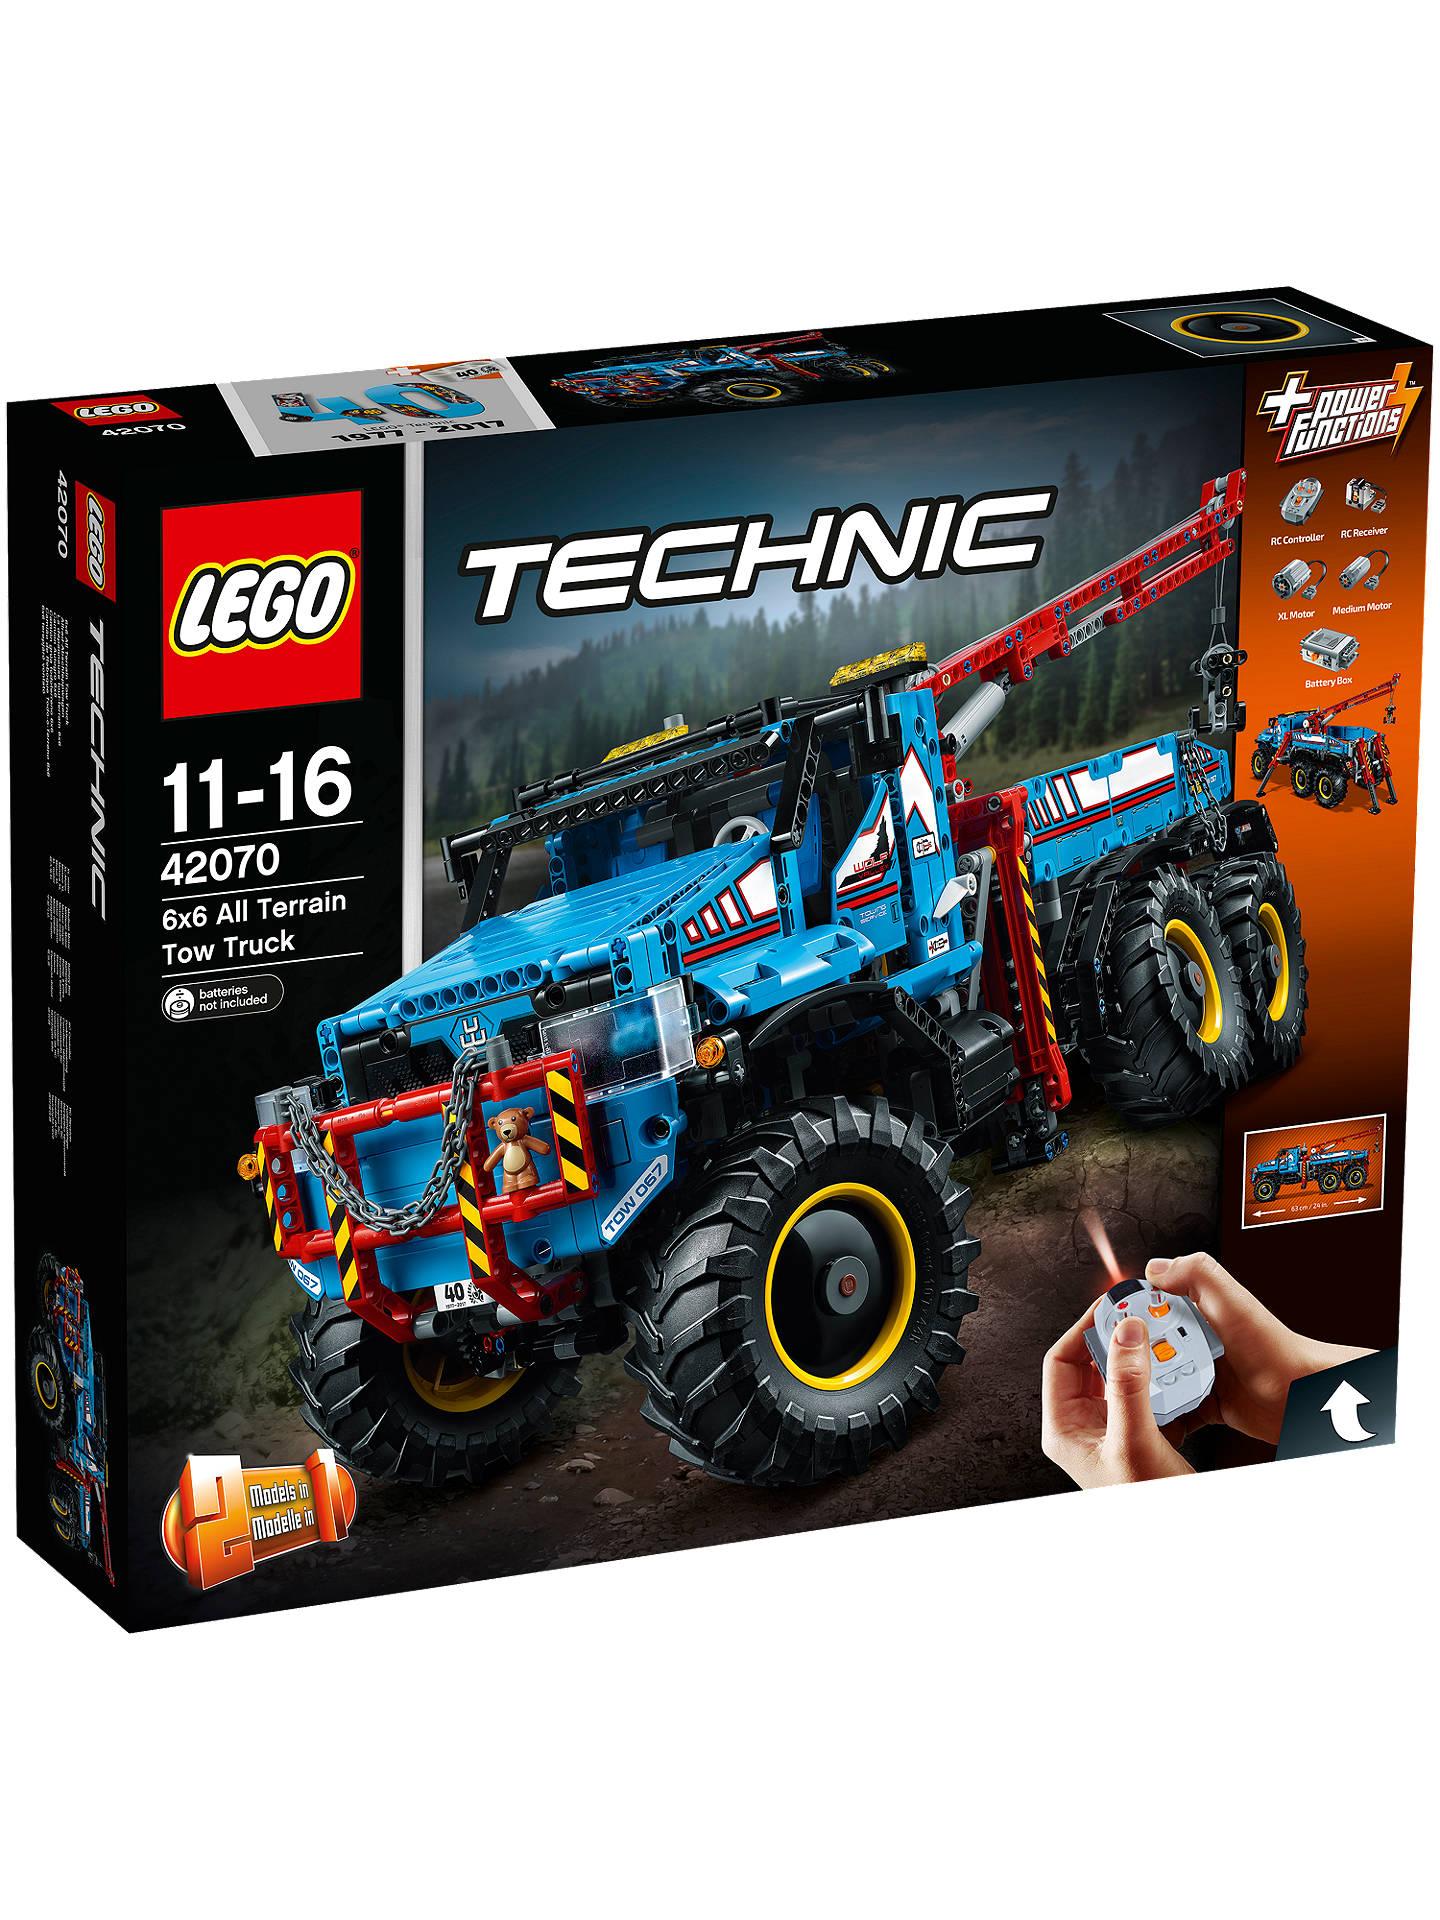 9932f0890ebda0 Buy LEGO Technic 42070 6x6 All Terrain Tow Truck Online at johnlewis.com ...